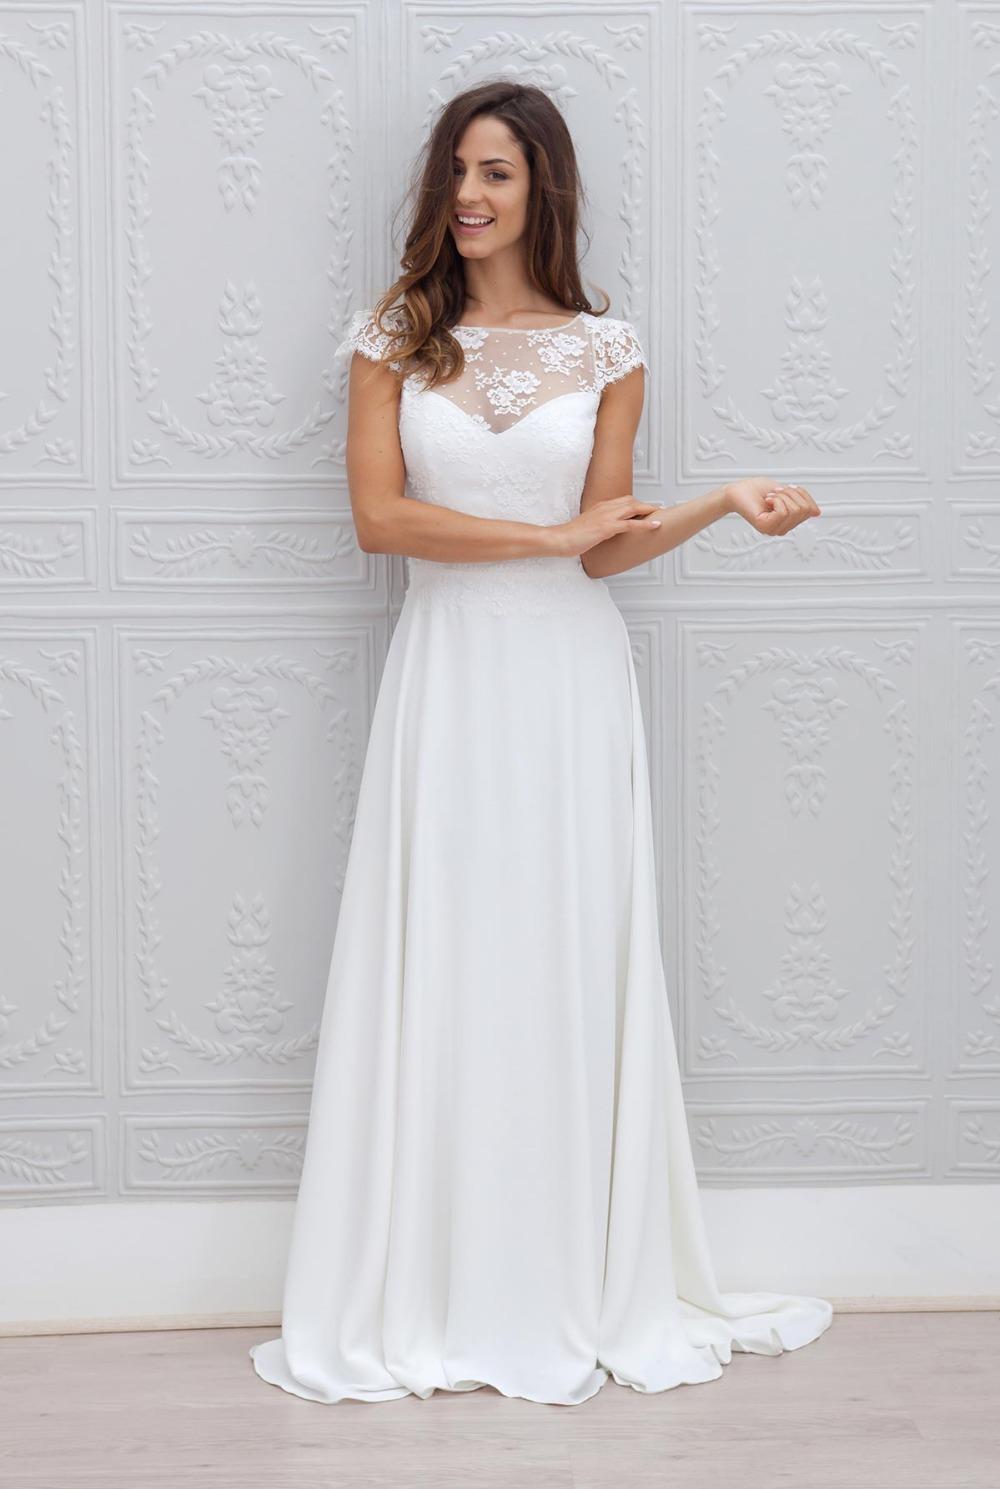 list detail boho wedding dresses with sleeves bohemian wedding dress cheap Popular items for boho wedding gown on Etsy